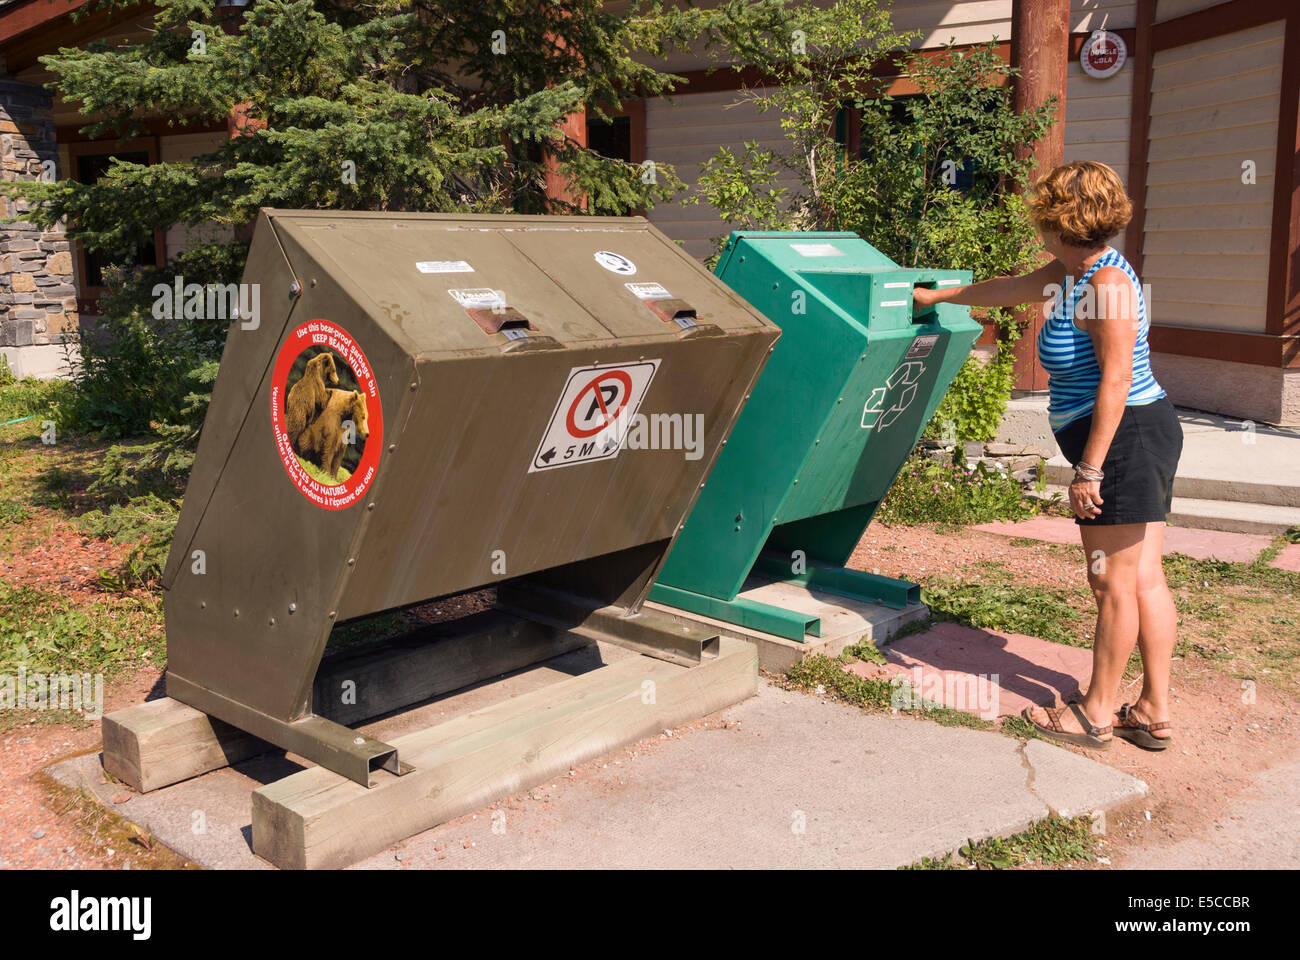 Elk203-2007 Canada, British Columbia, Kootenay National Park, recycling bins Stock Photo